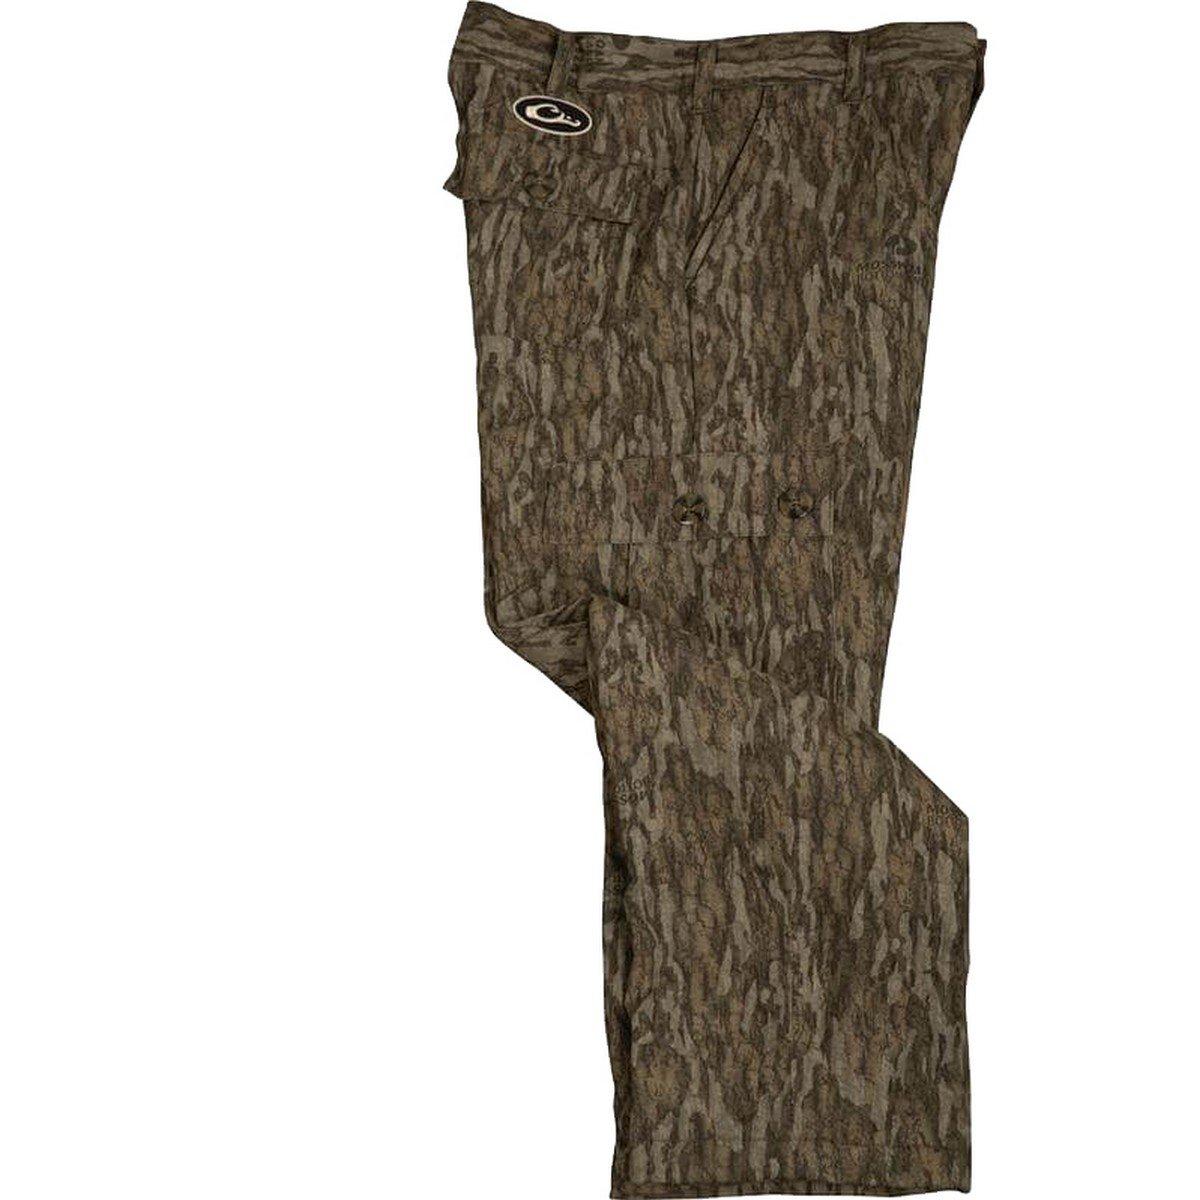 Drake Youth MST Windproof Bonded Fleece Pant Mossy Oak Bottomland 16 by Drake